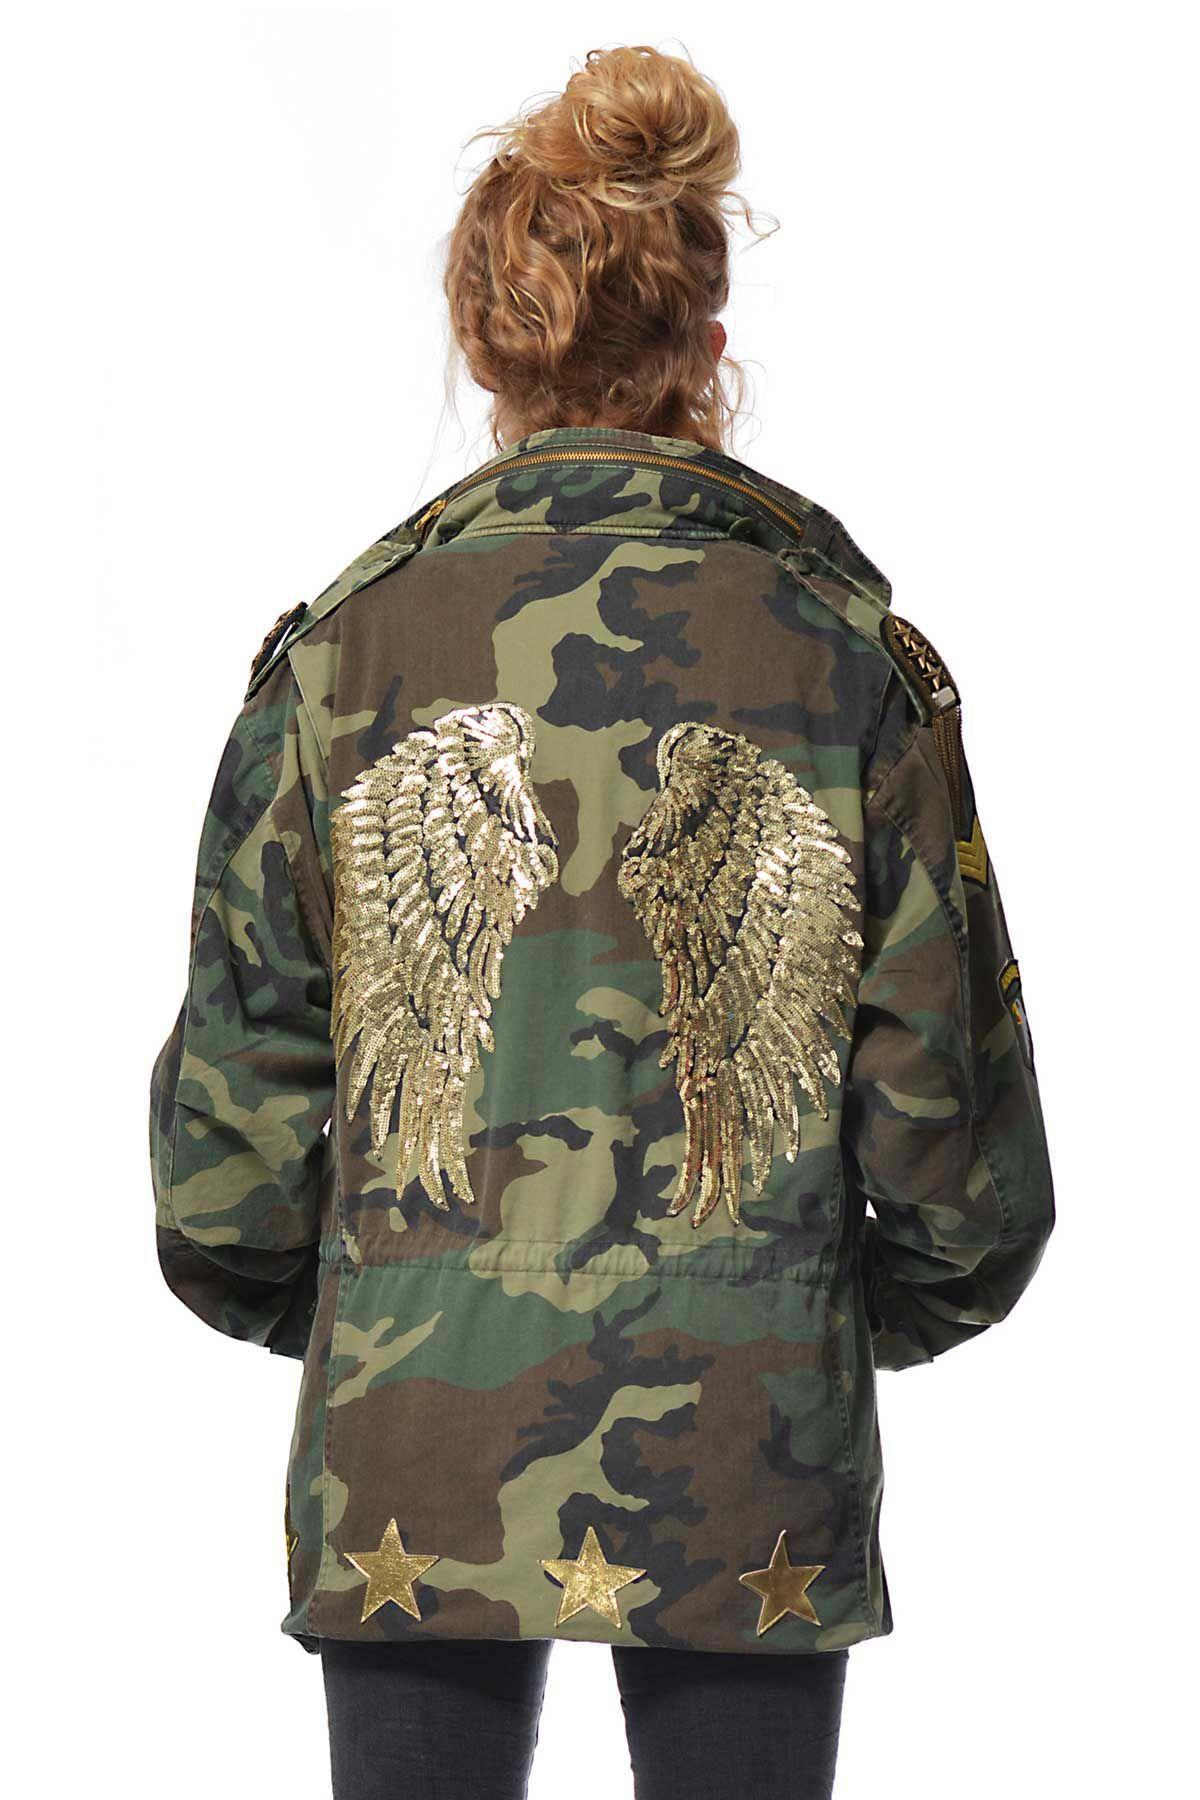 64292fa98980c Parka Angel Wings Military Clothing, Military Style, Military Jacket, Camo  Fashion, Military